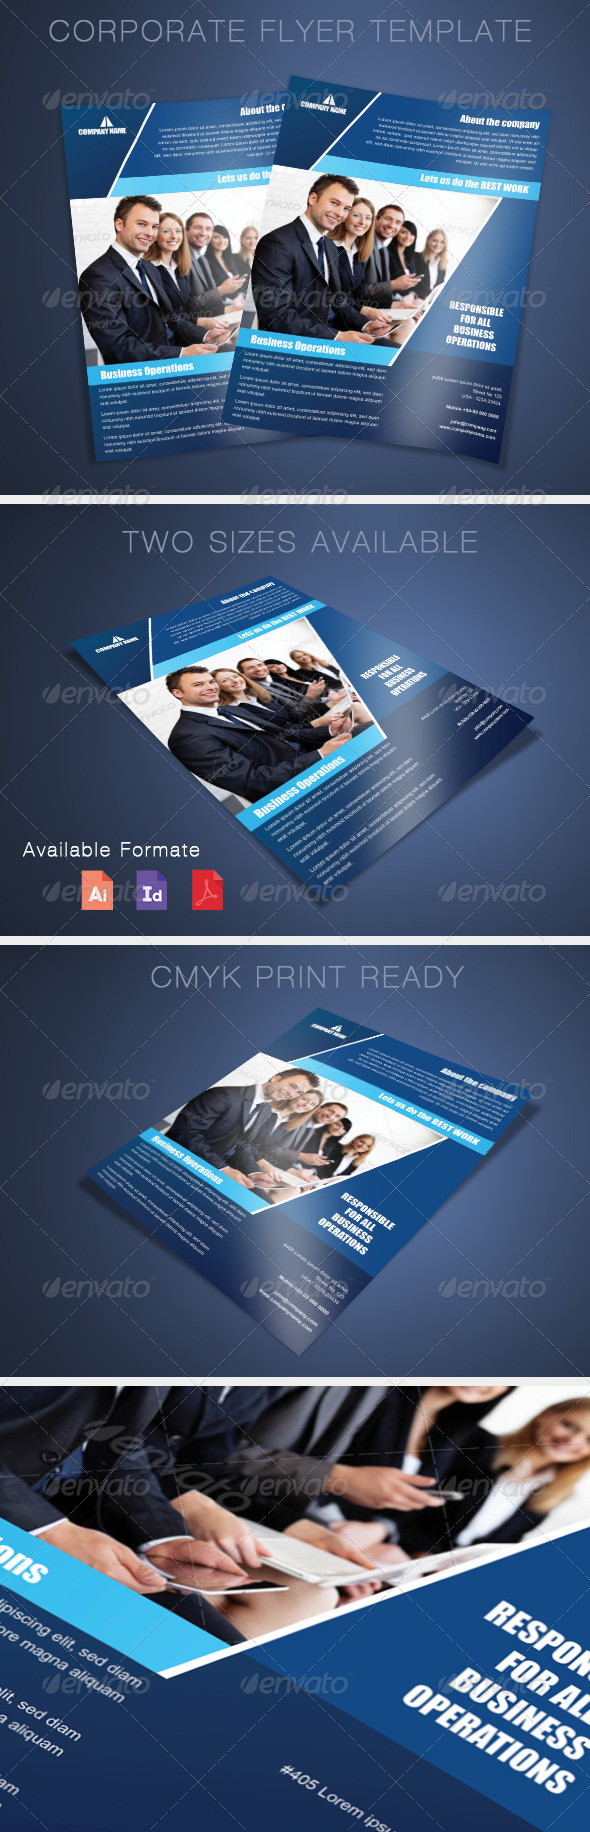 GraphicRiver Corporate Flyer Template 7811782